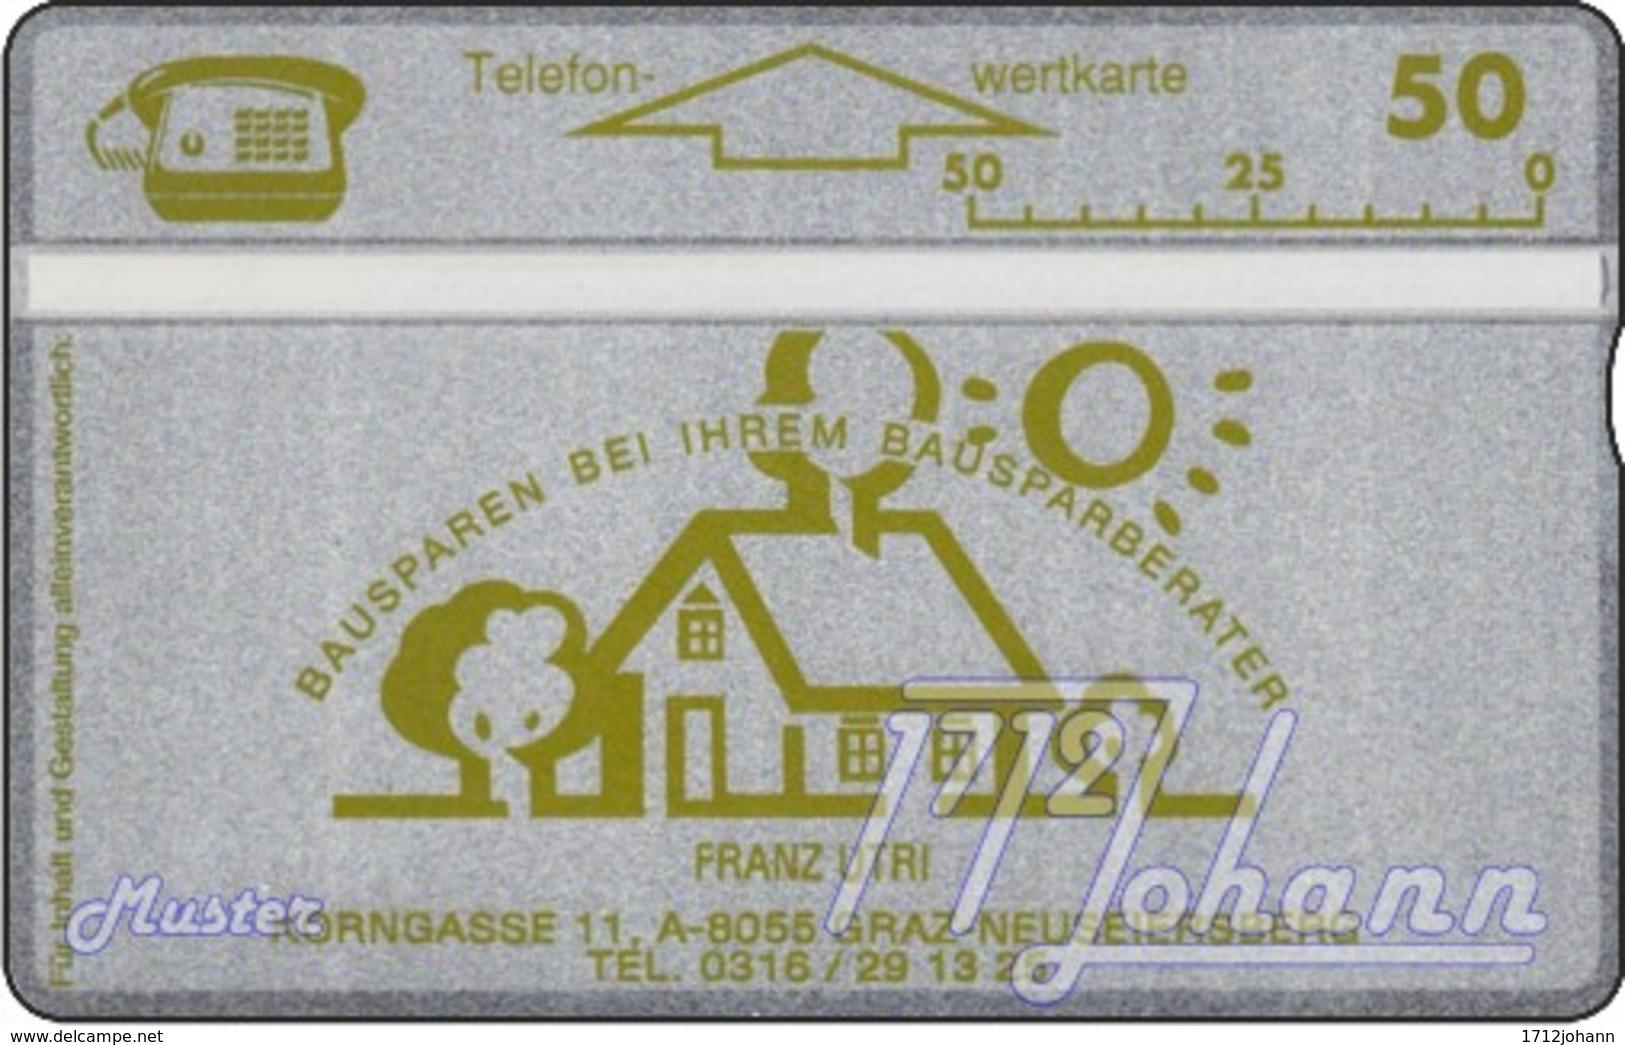 AUSTRIA Private: *Utri - Bausparen* - SAMPLE [ANK P259N] - Oesterreich